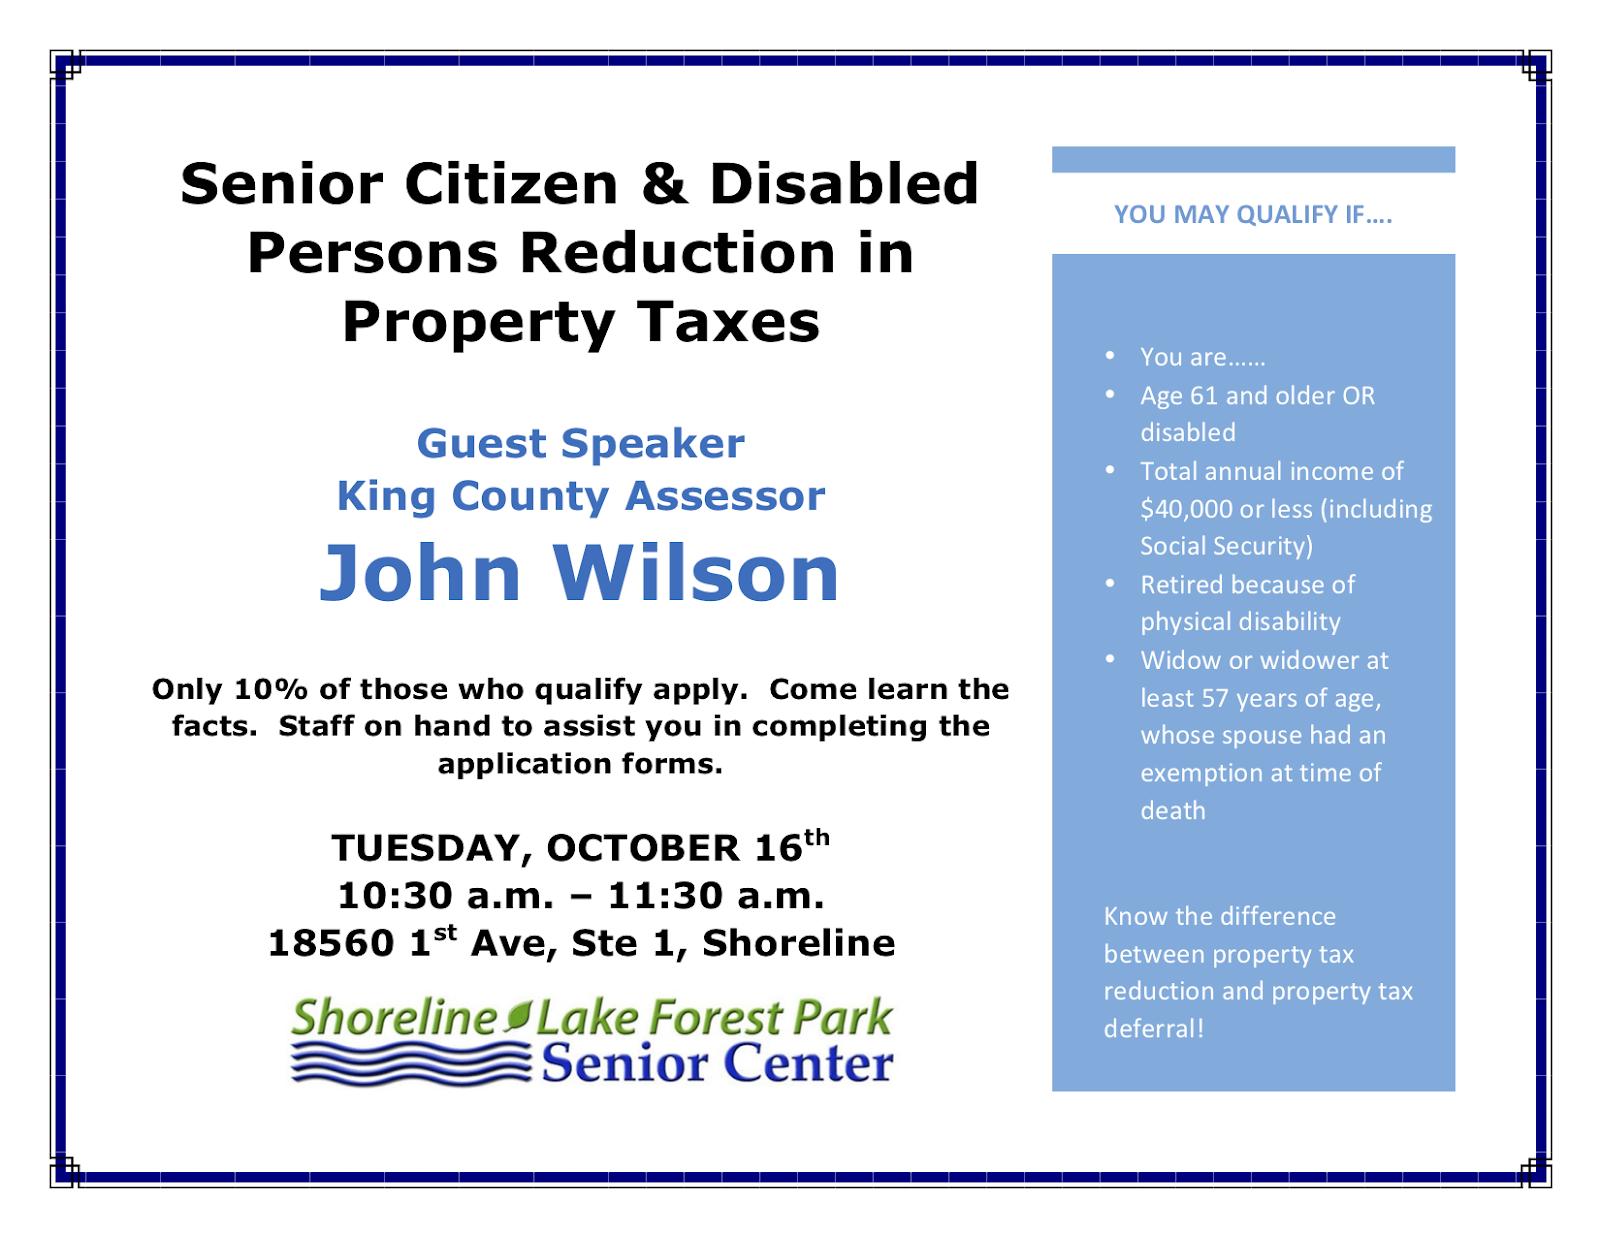 Shoreline Area News: King County Assessor John Wilson at SL-LFP